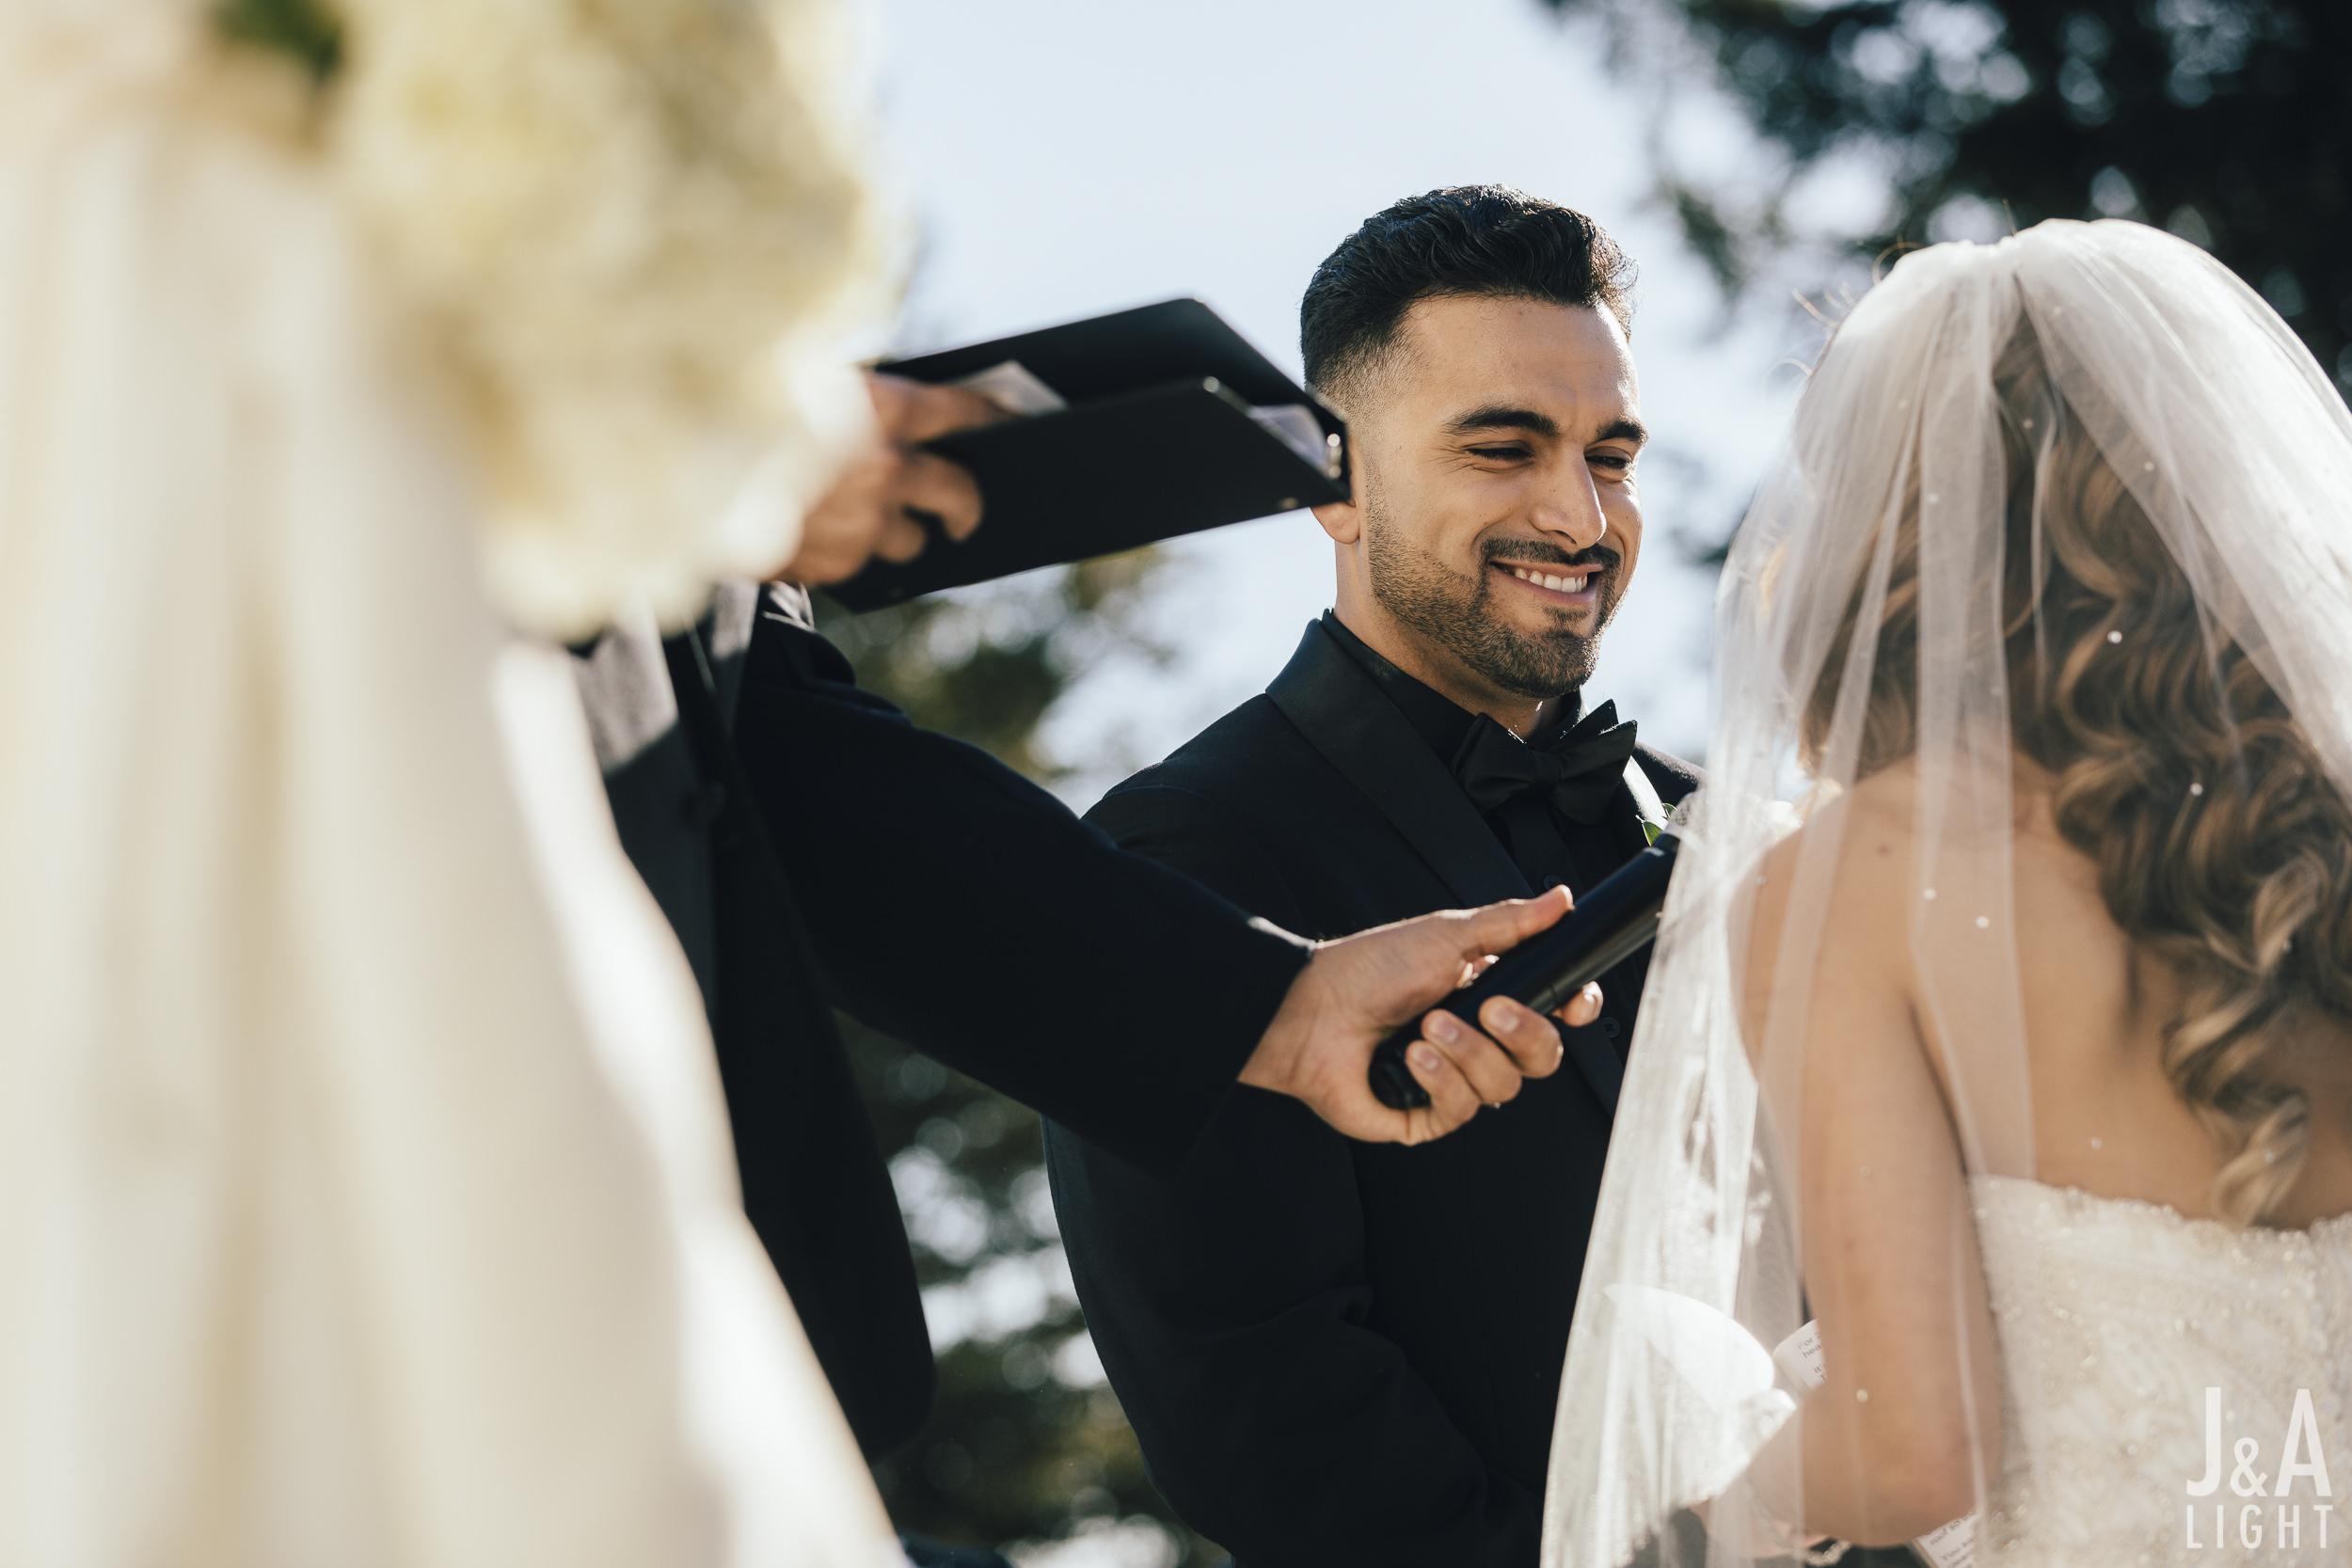 20171014-JanDan-LosBanos-GlassMansion-Wedding-Blog-038.jpg